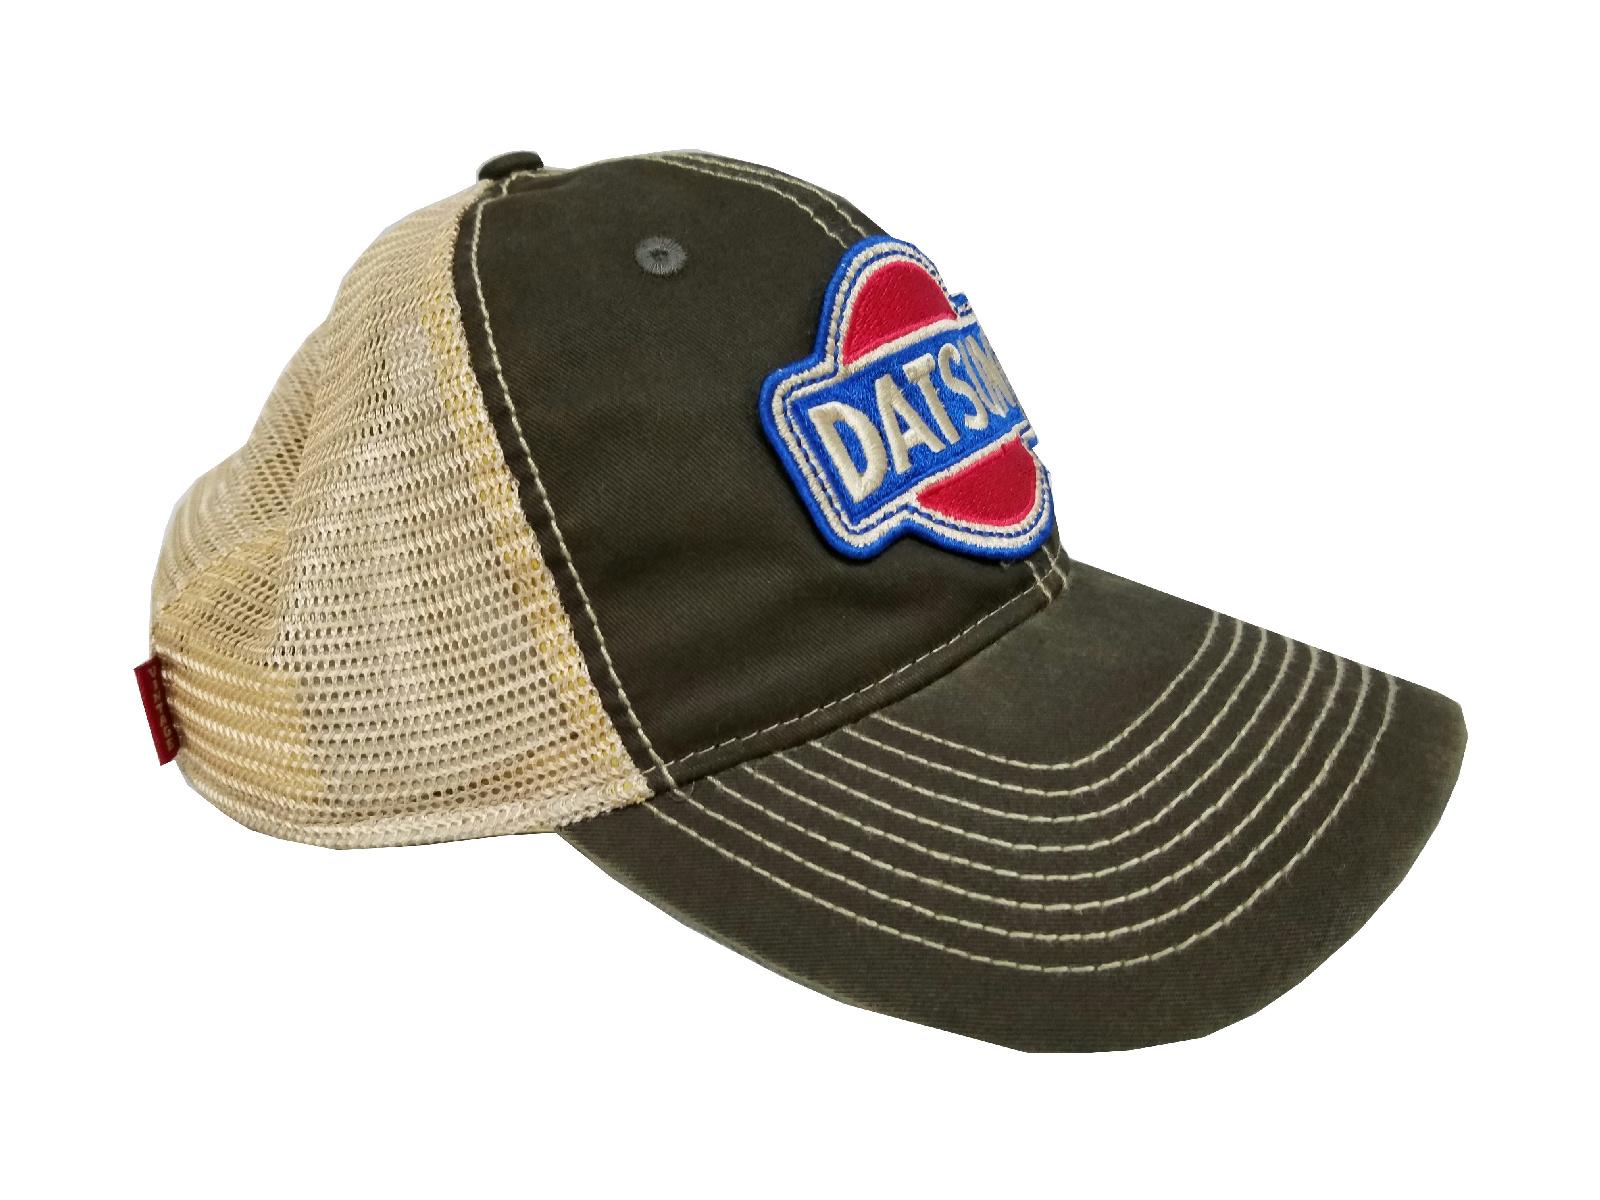 12f8db0d65d Vintage Datsun Tea-Stained Mesh Snapback Cap (Black)